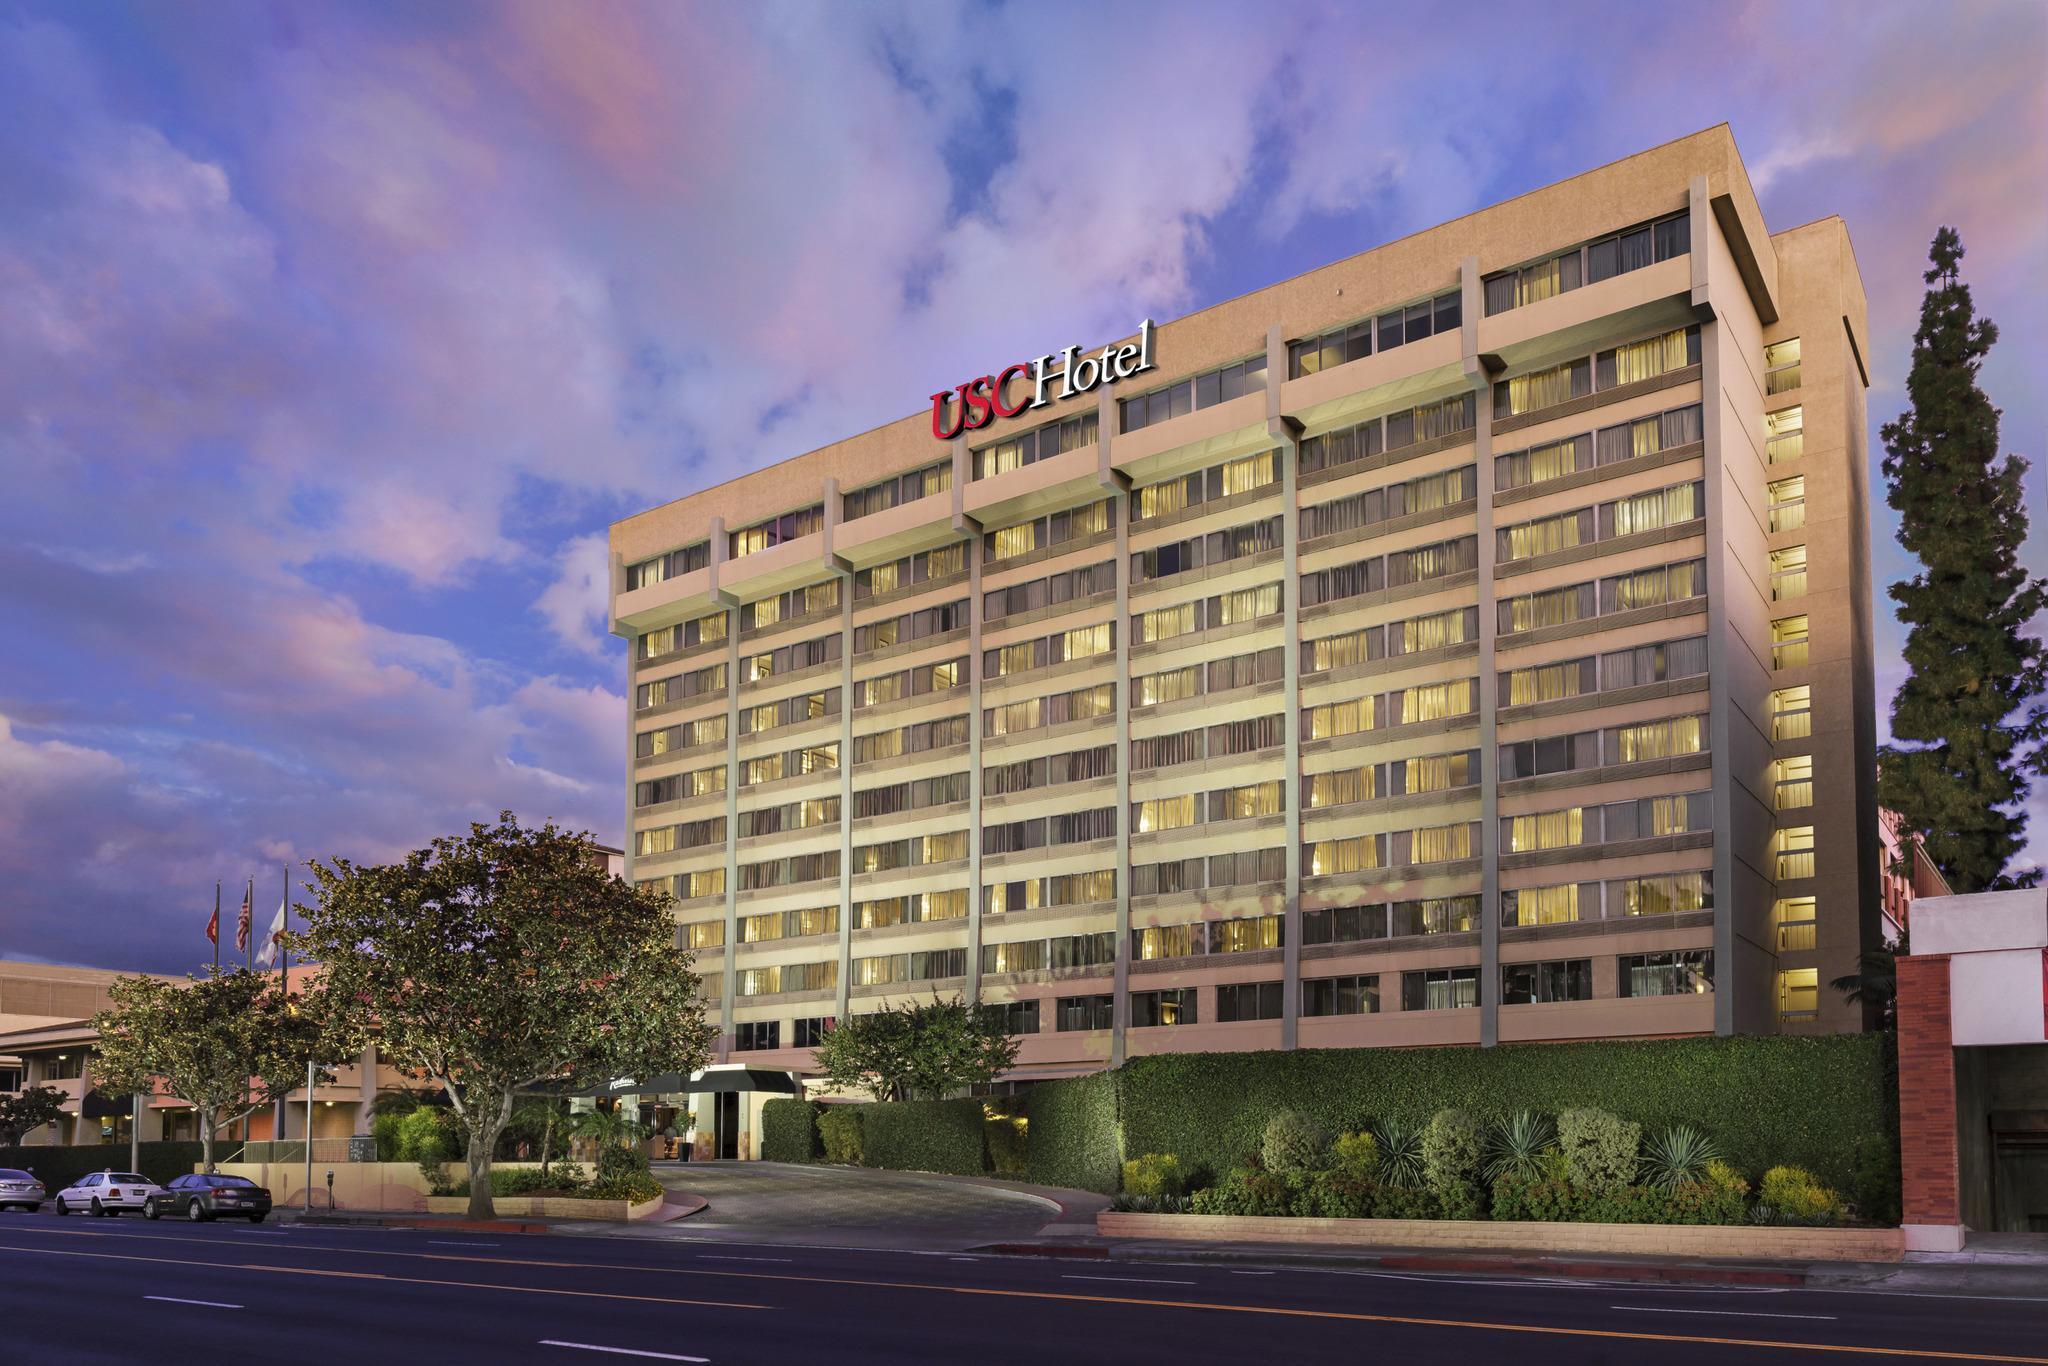 USC Hotel